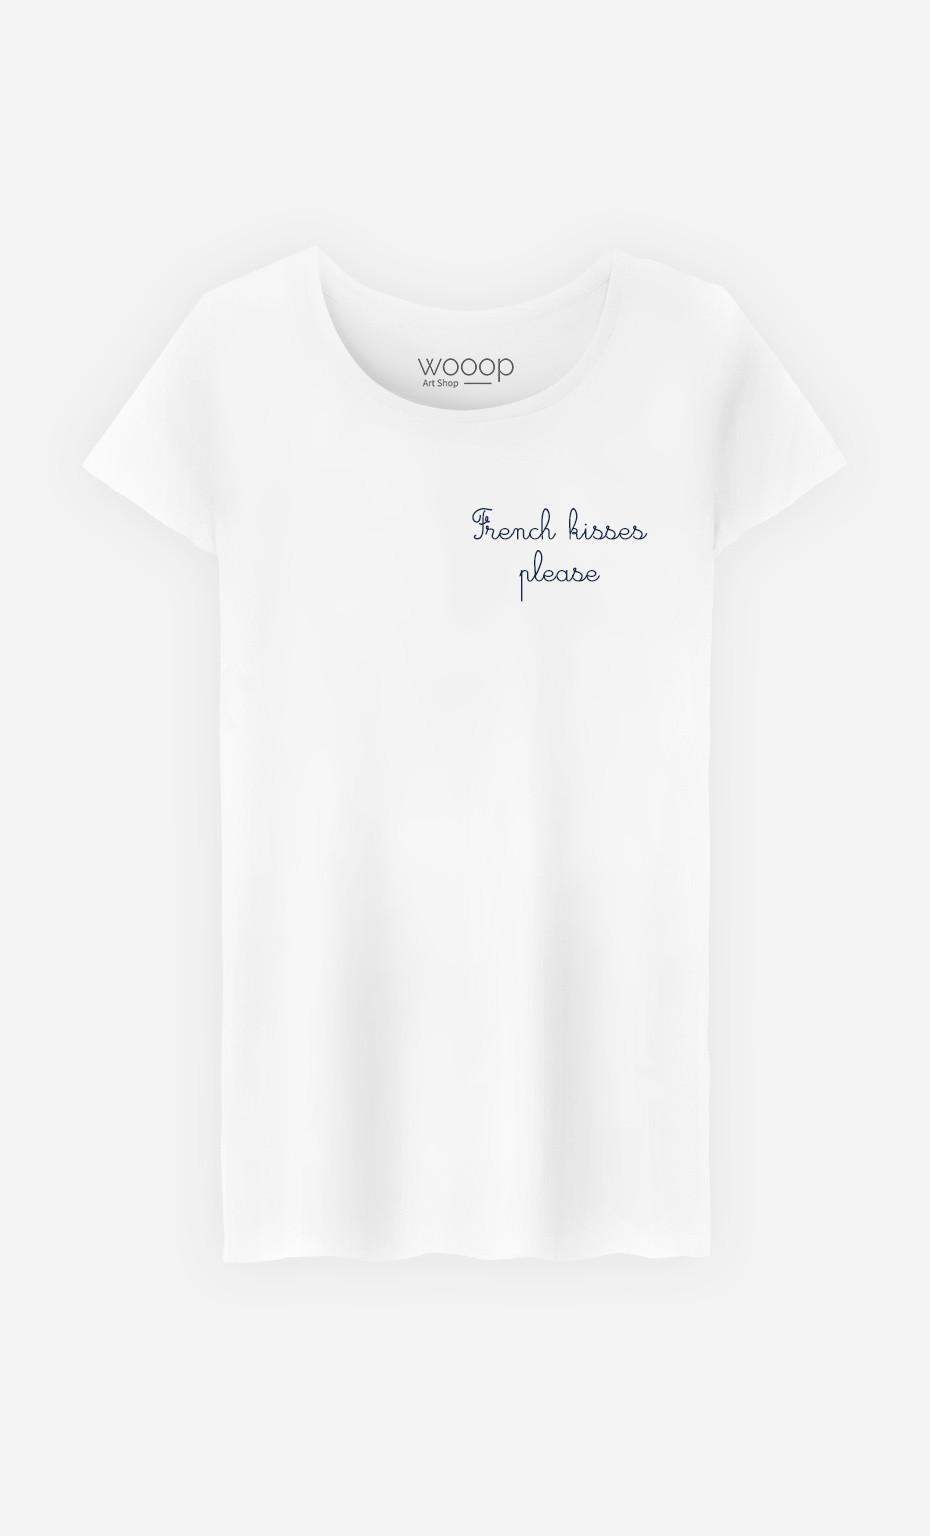 T-Shirt French Kisses Please - Brodé